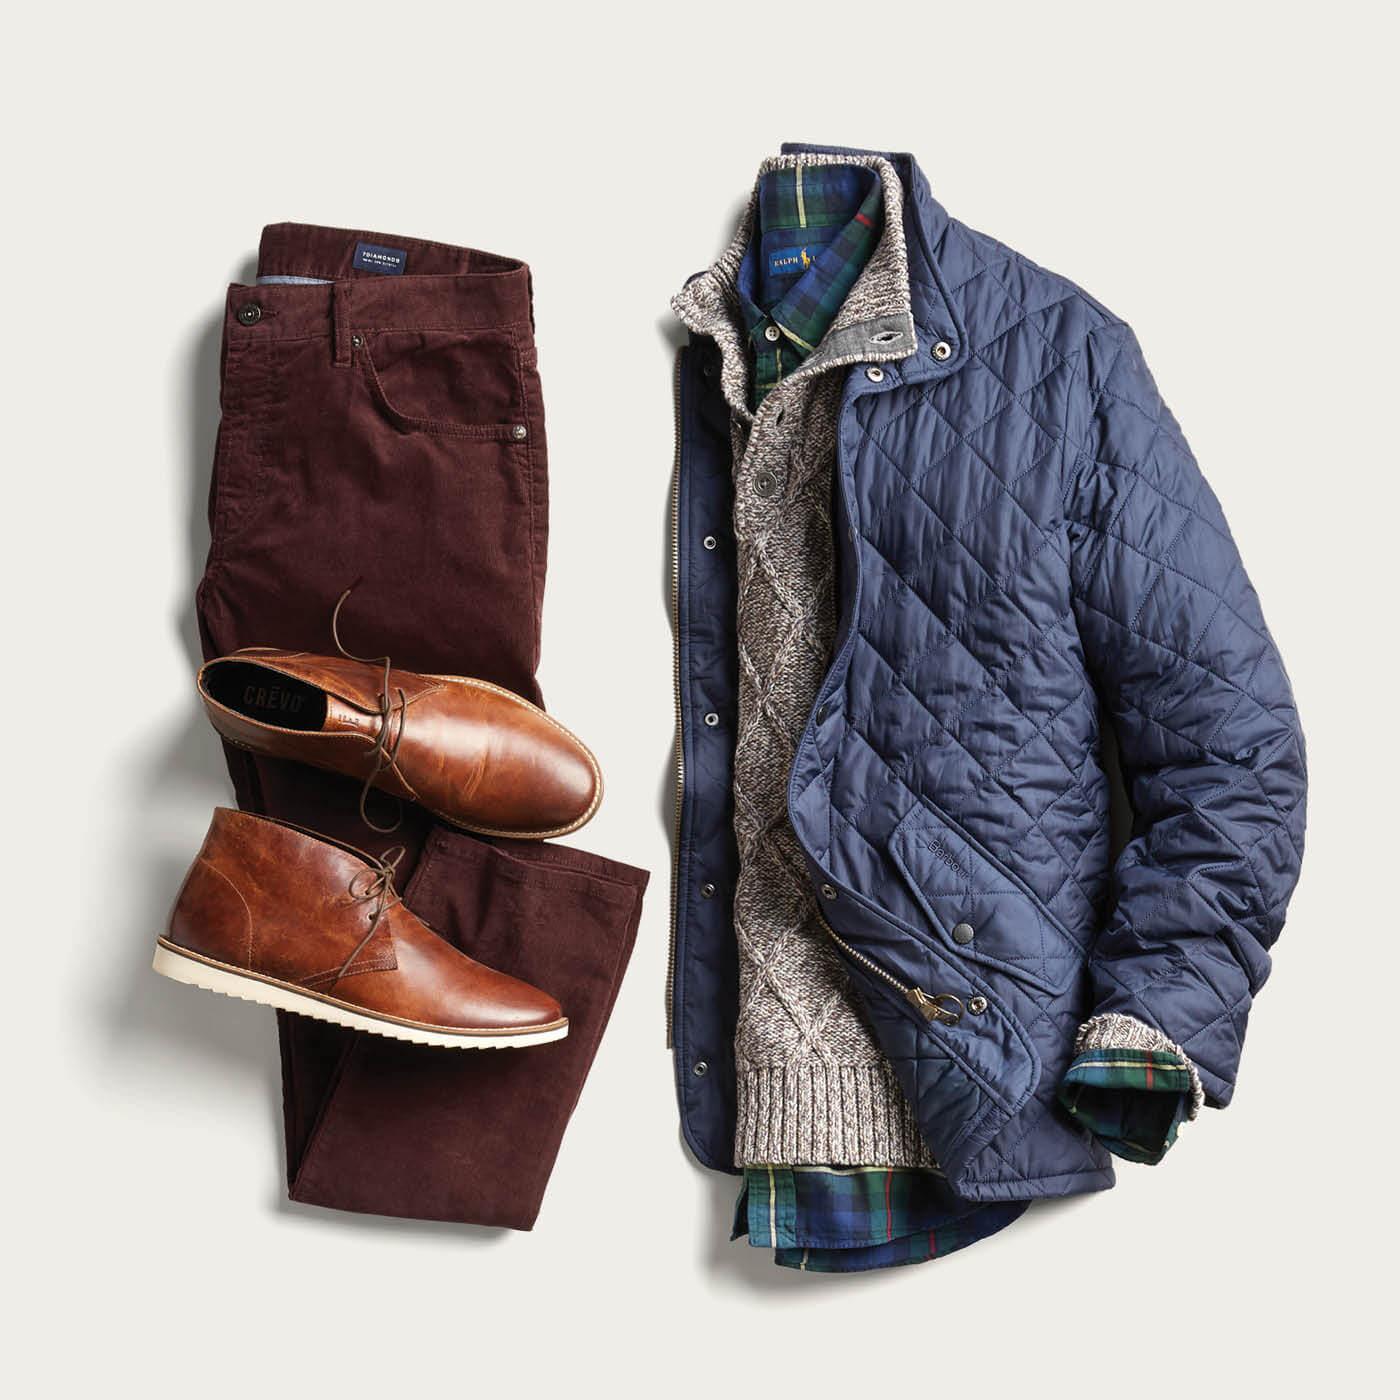 blue jacket and brown corduroy pants